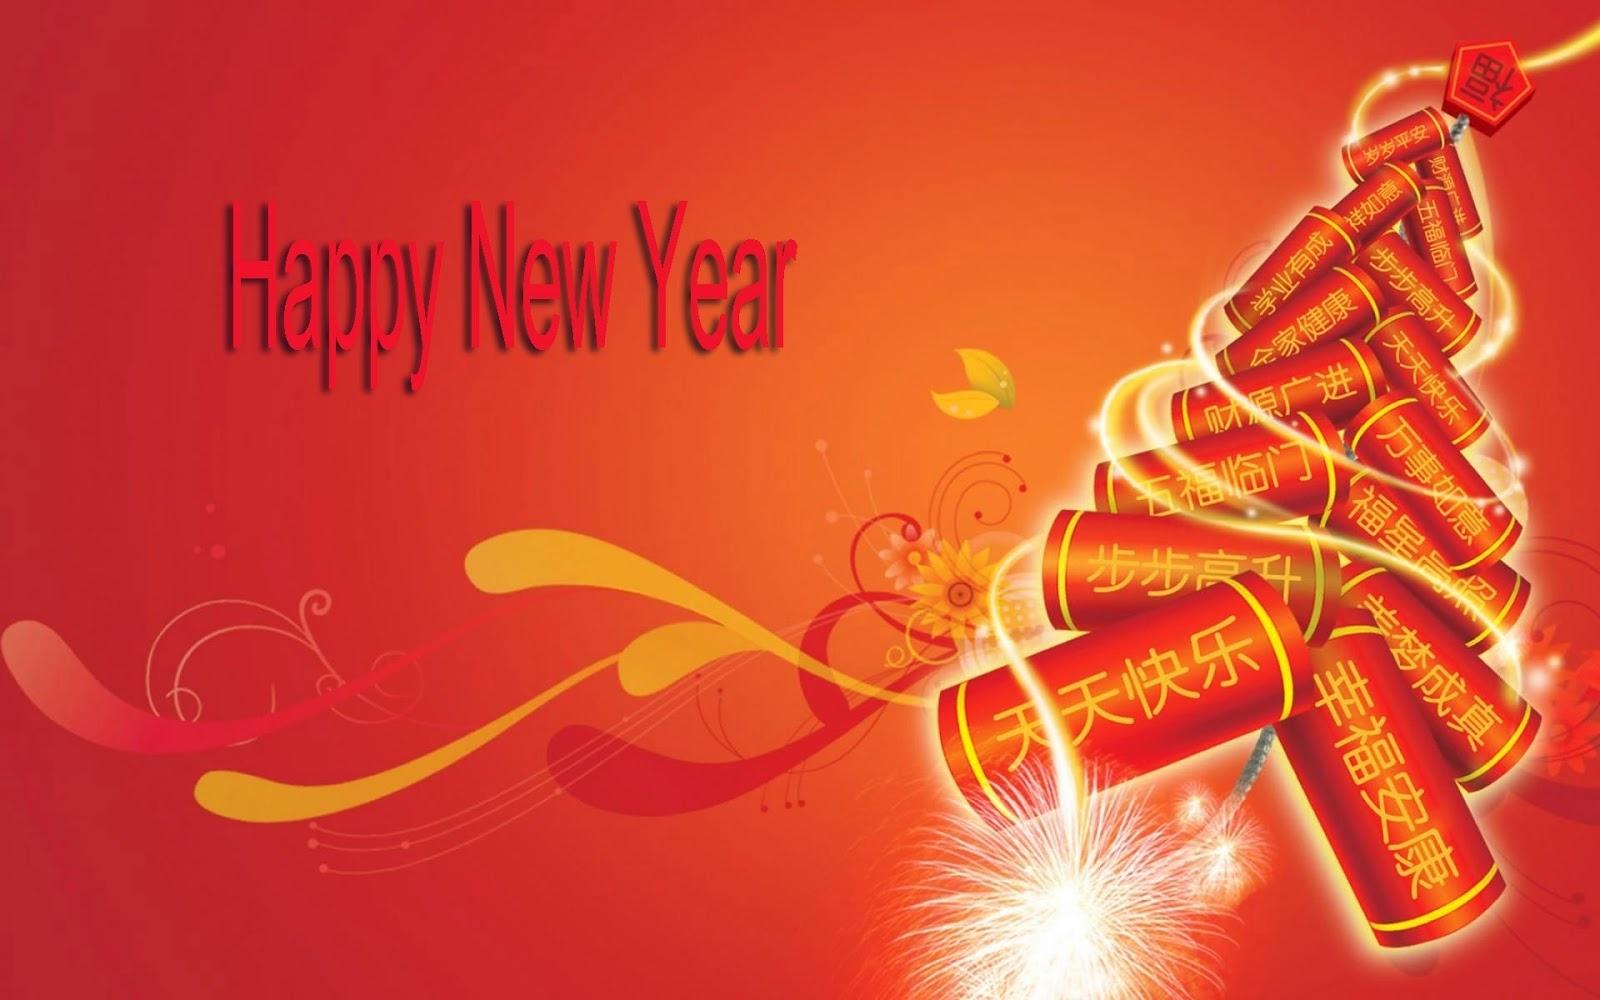 happy lunar new year message 32+ - happynewyearwallpaper